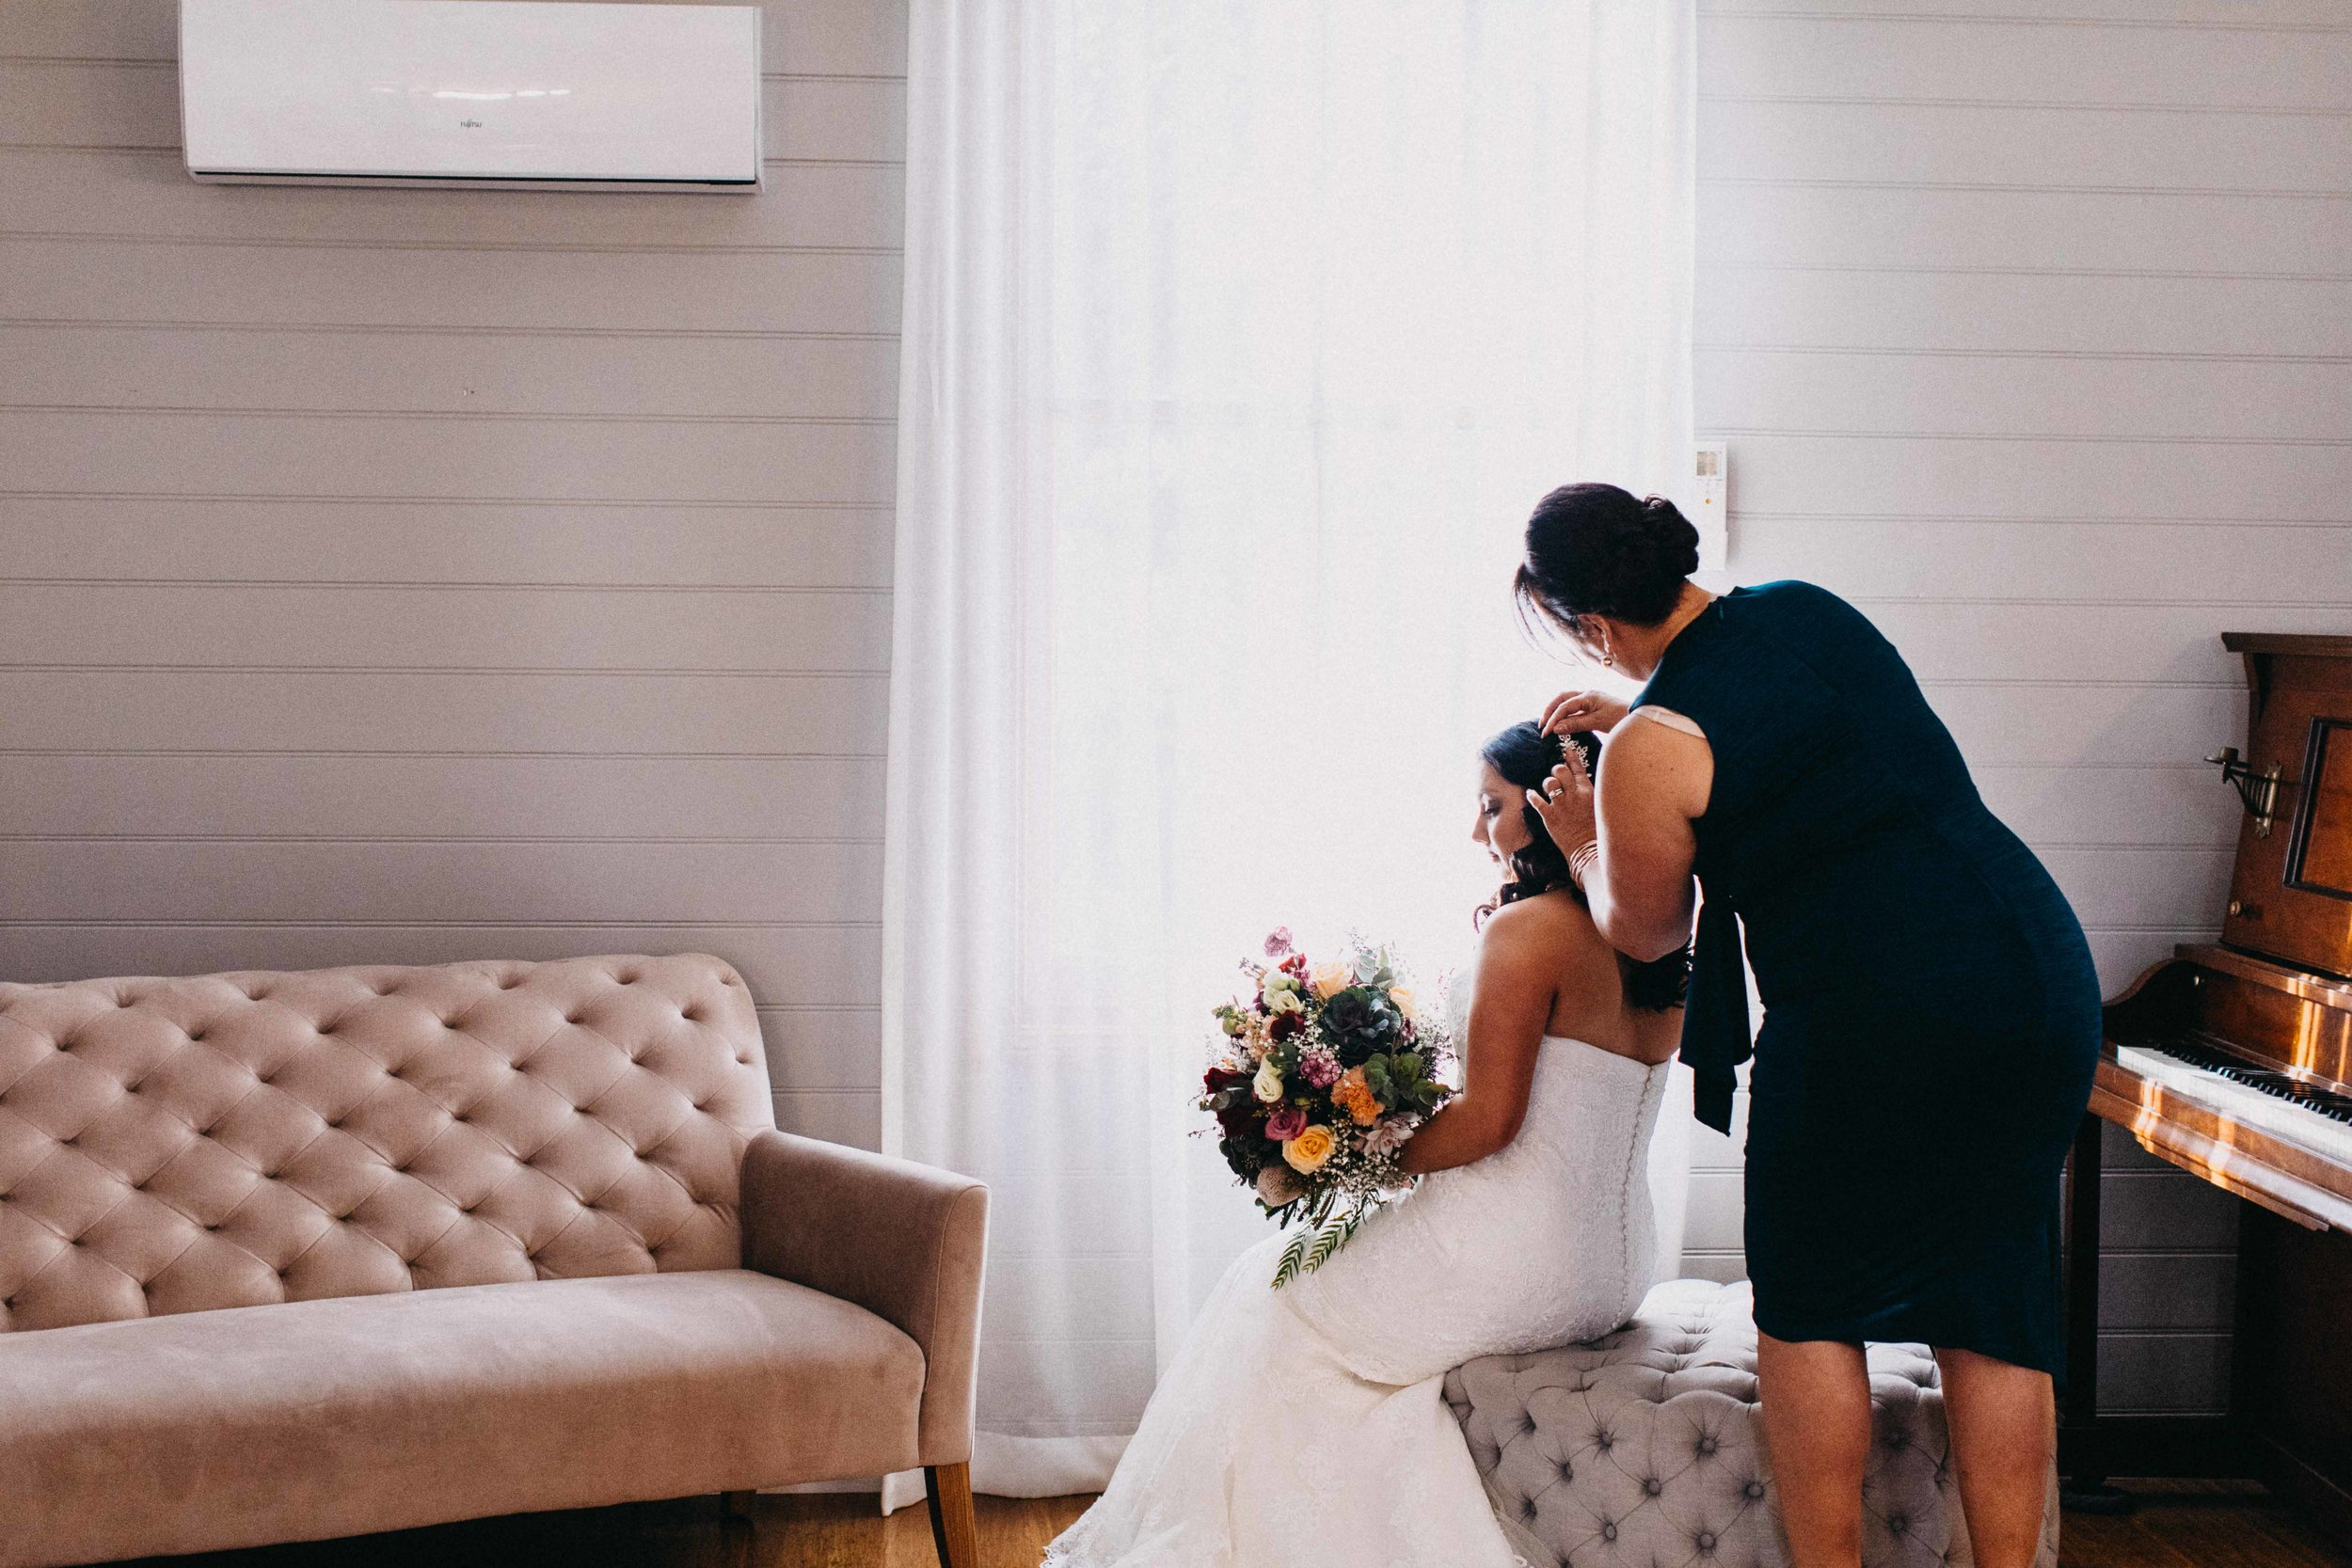 burnham-grove-camden-wedding-emilyobrienphotography-macarthur-46.jpg